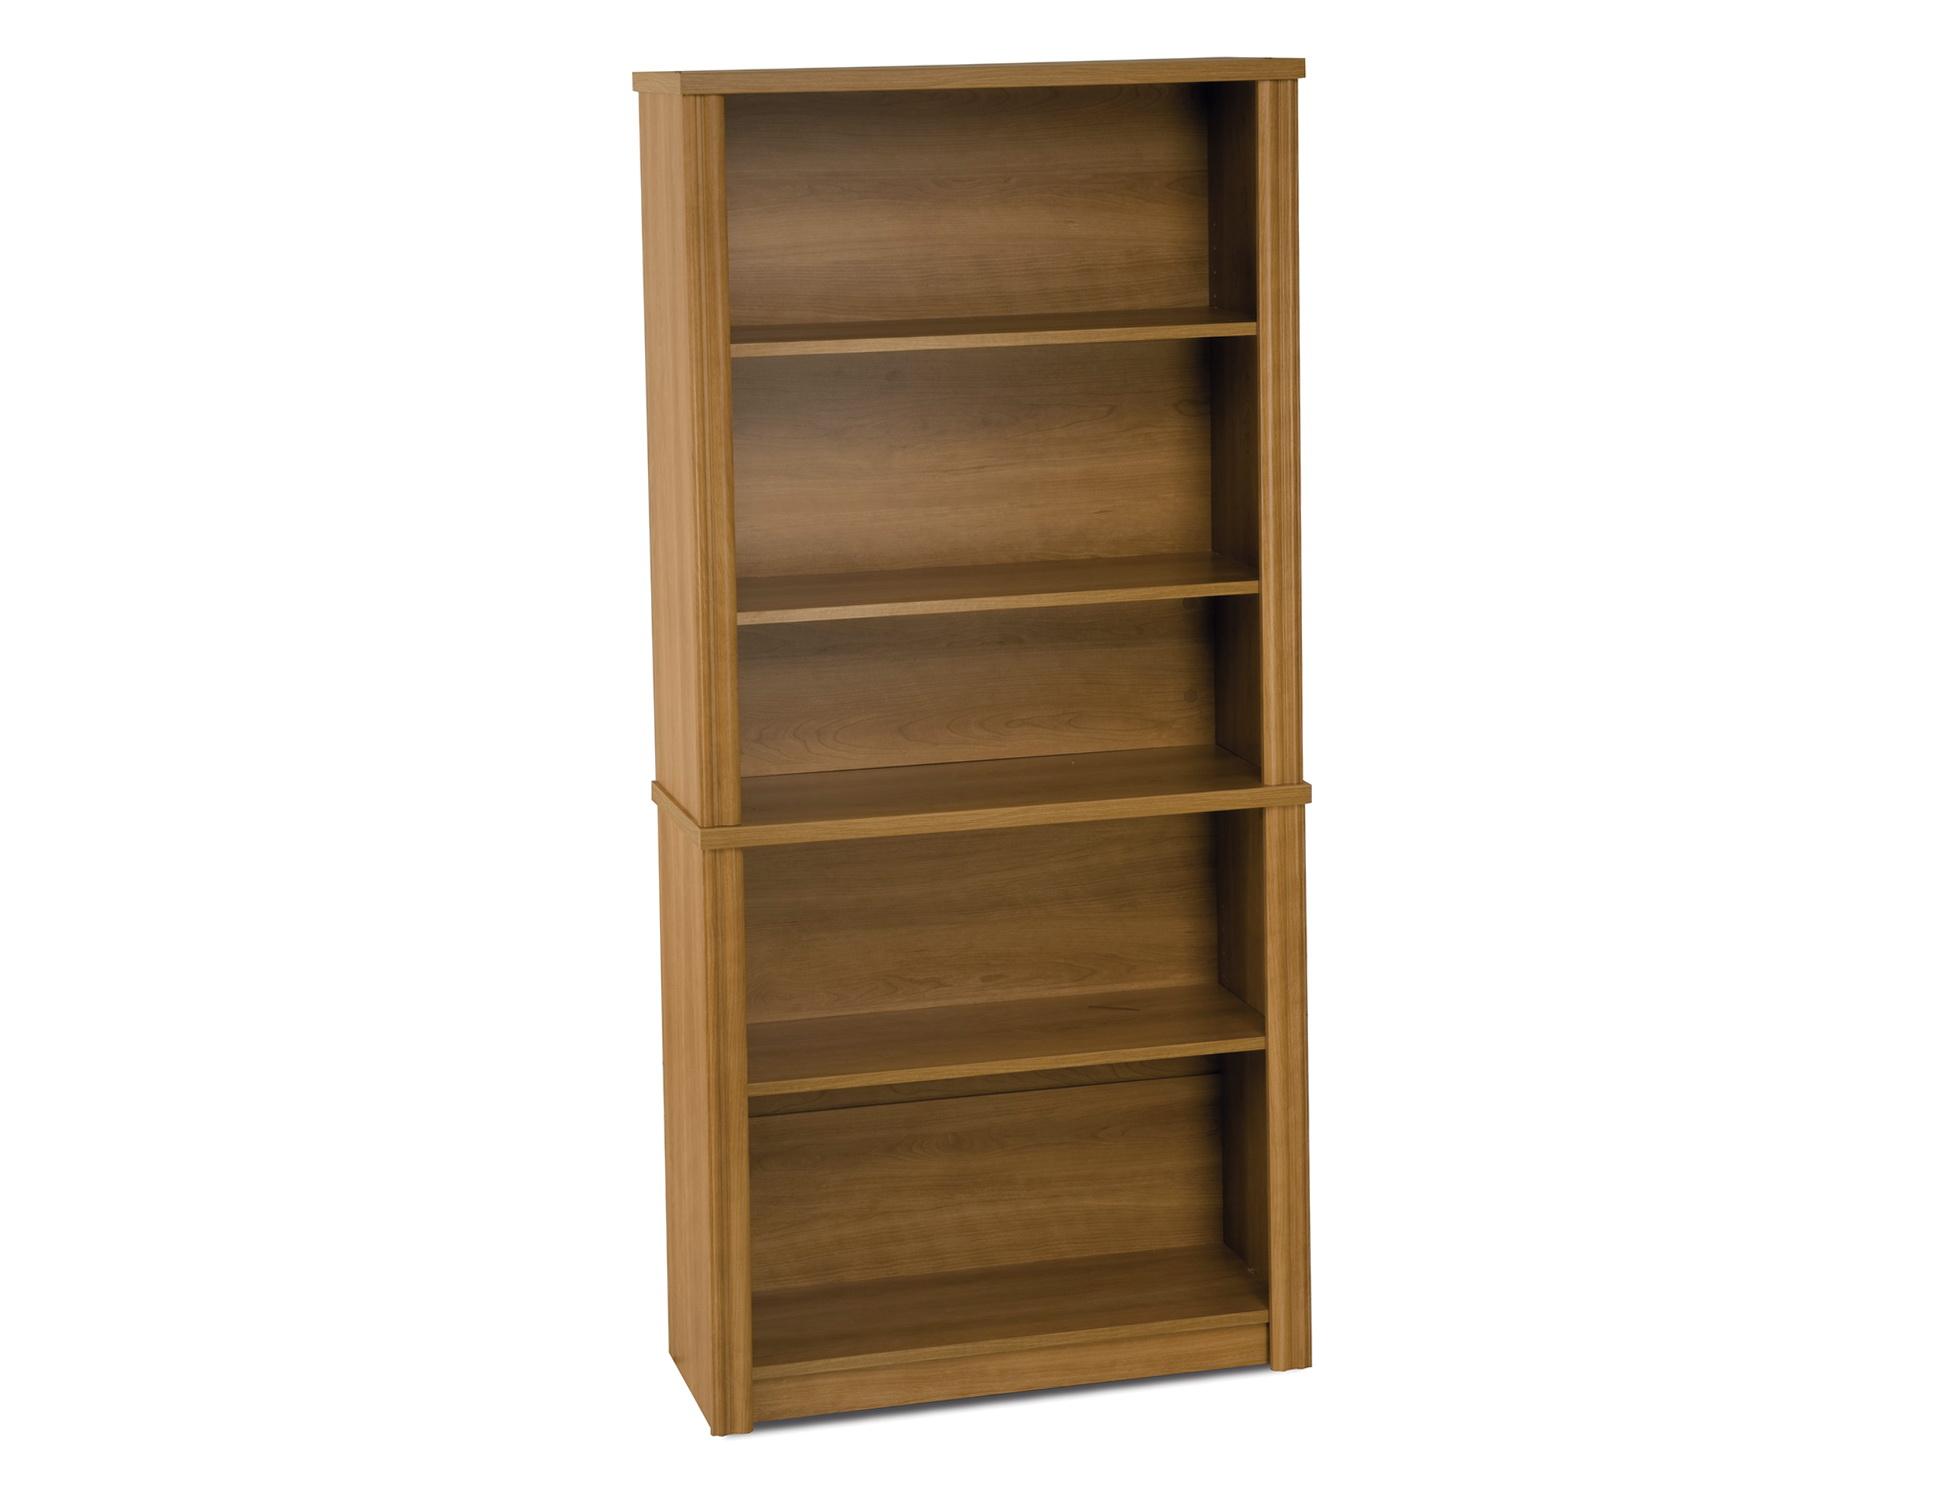 5 Shelf Bookcase Walmart